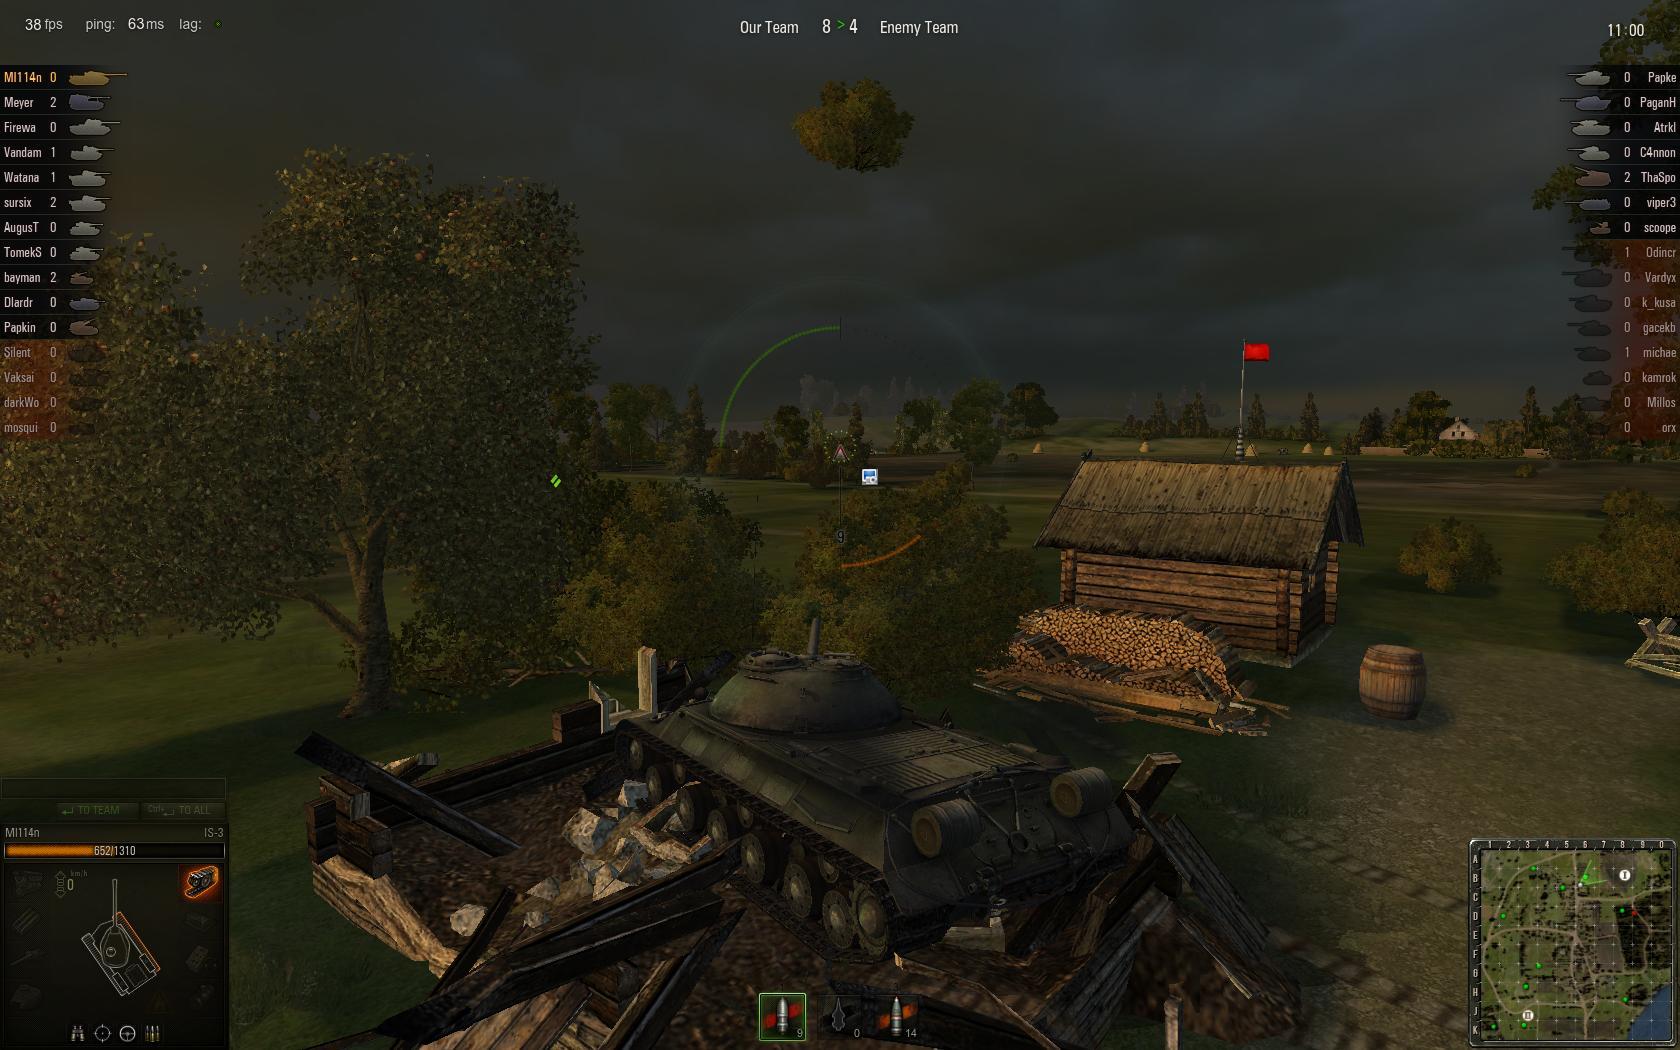 World of Tanks Стрельба с руин